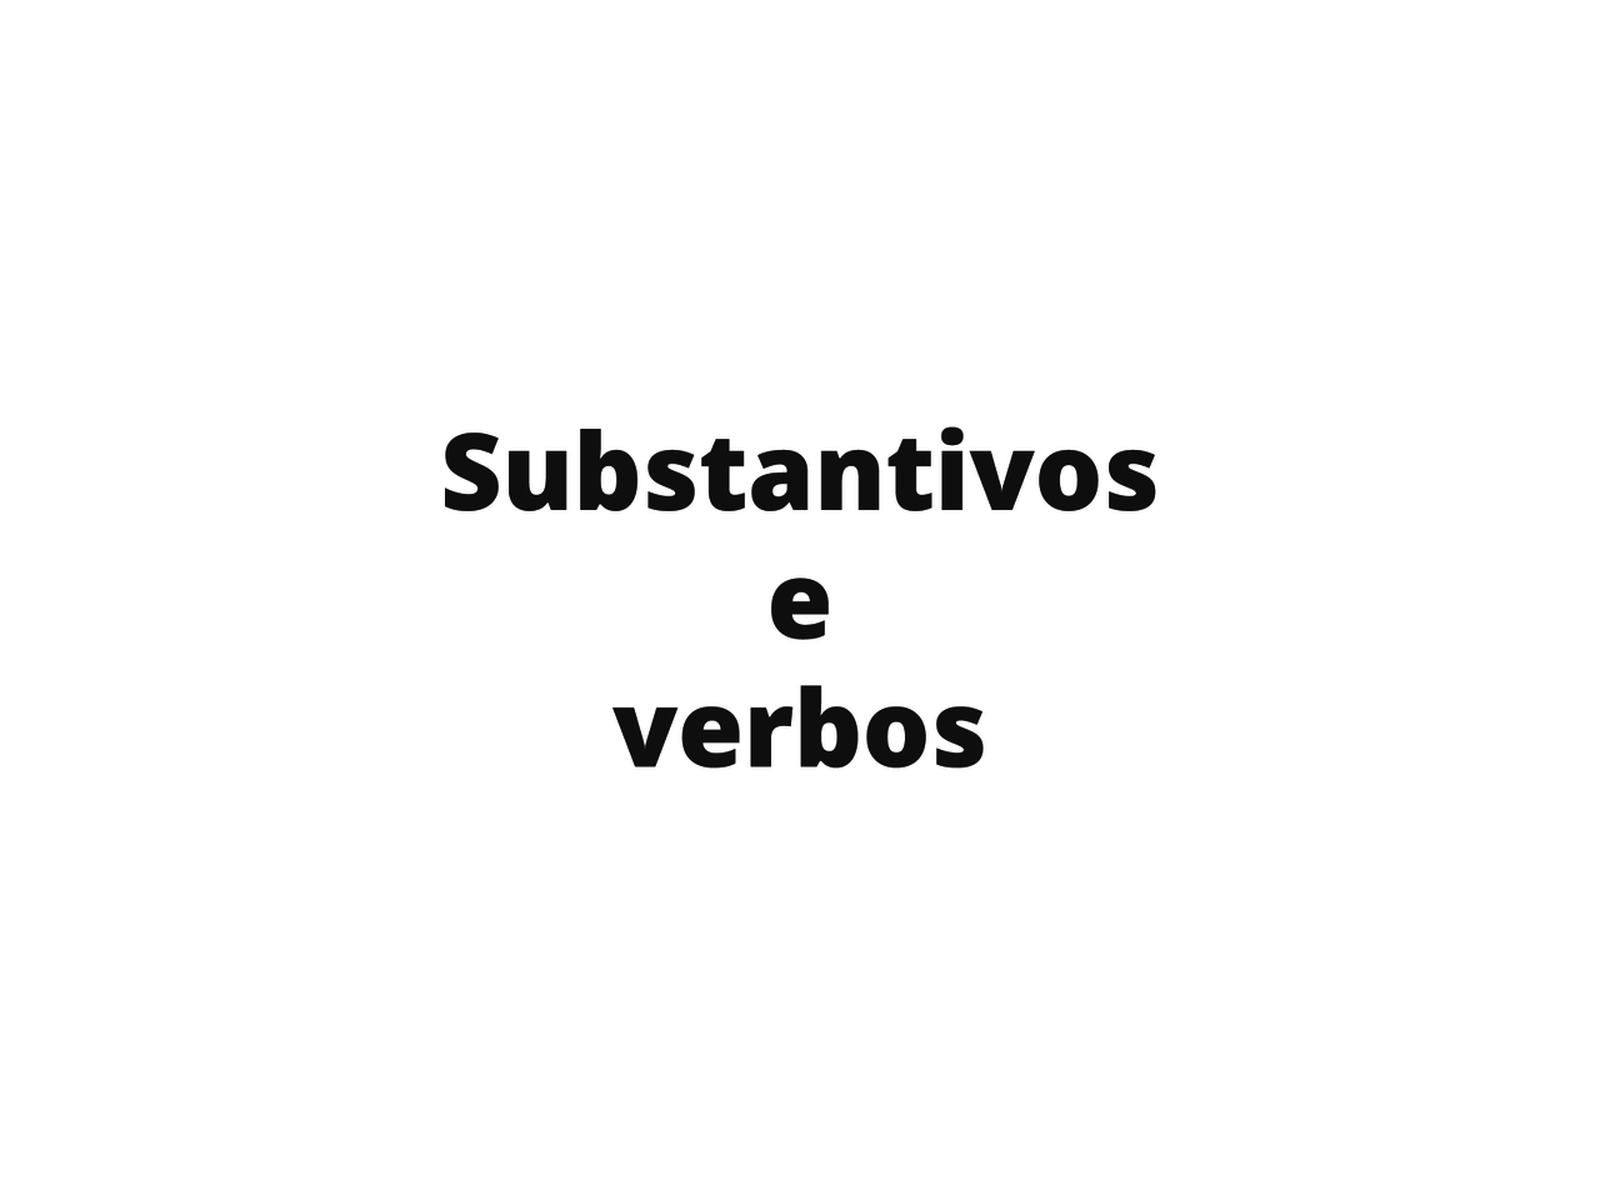 Entre substantivos e verbos.